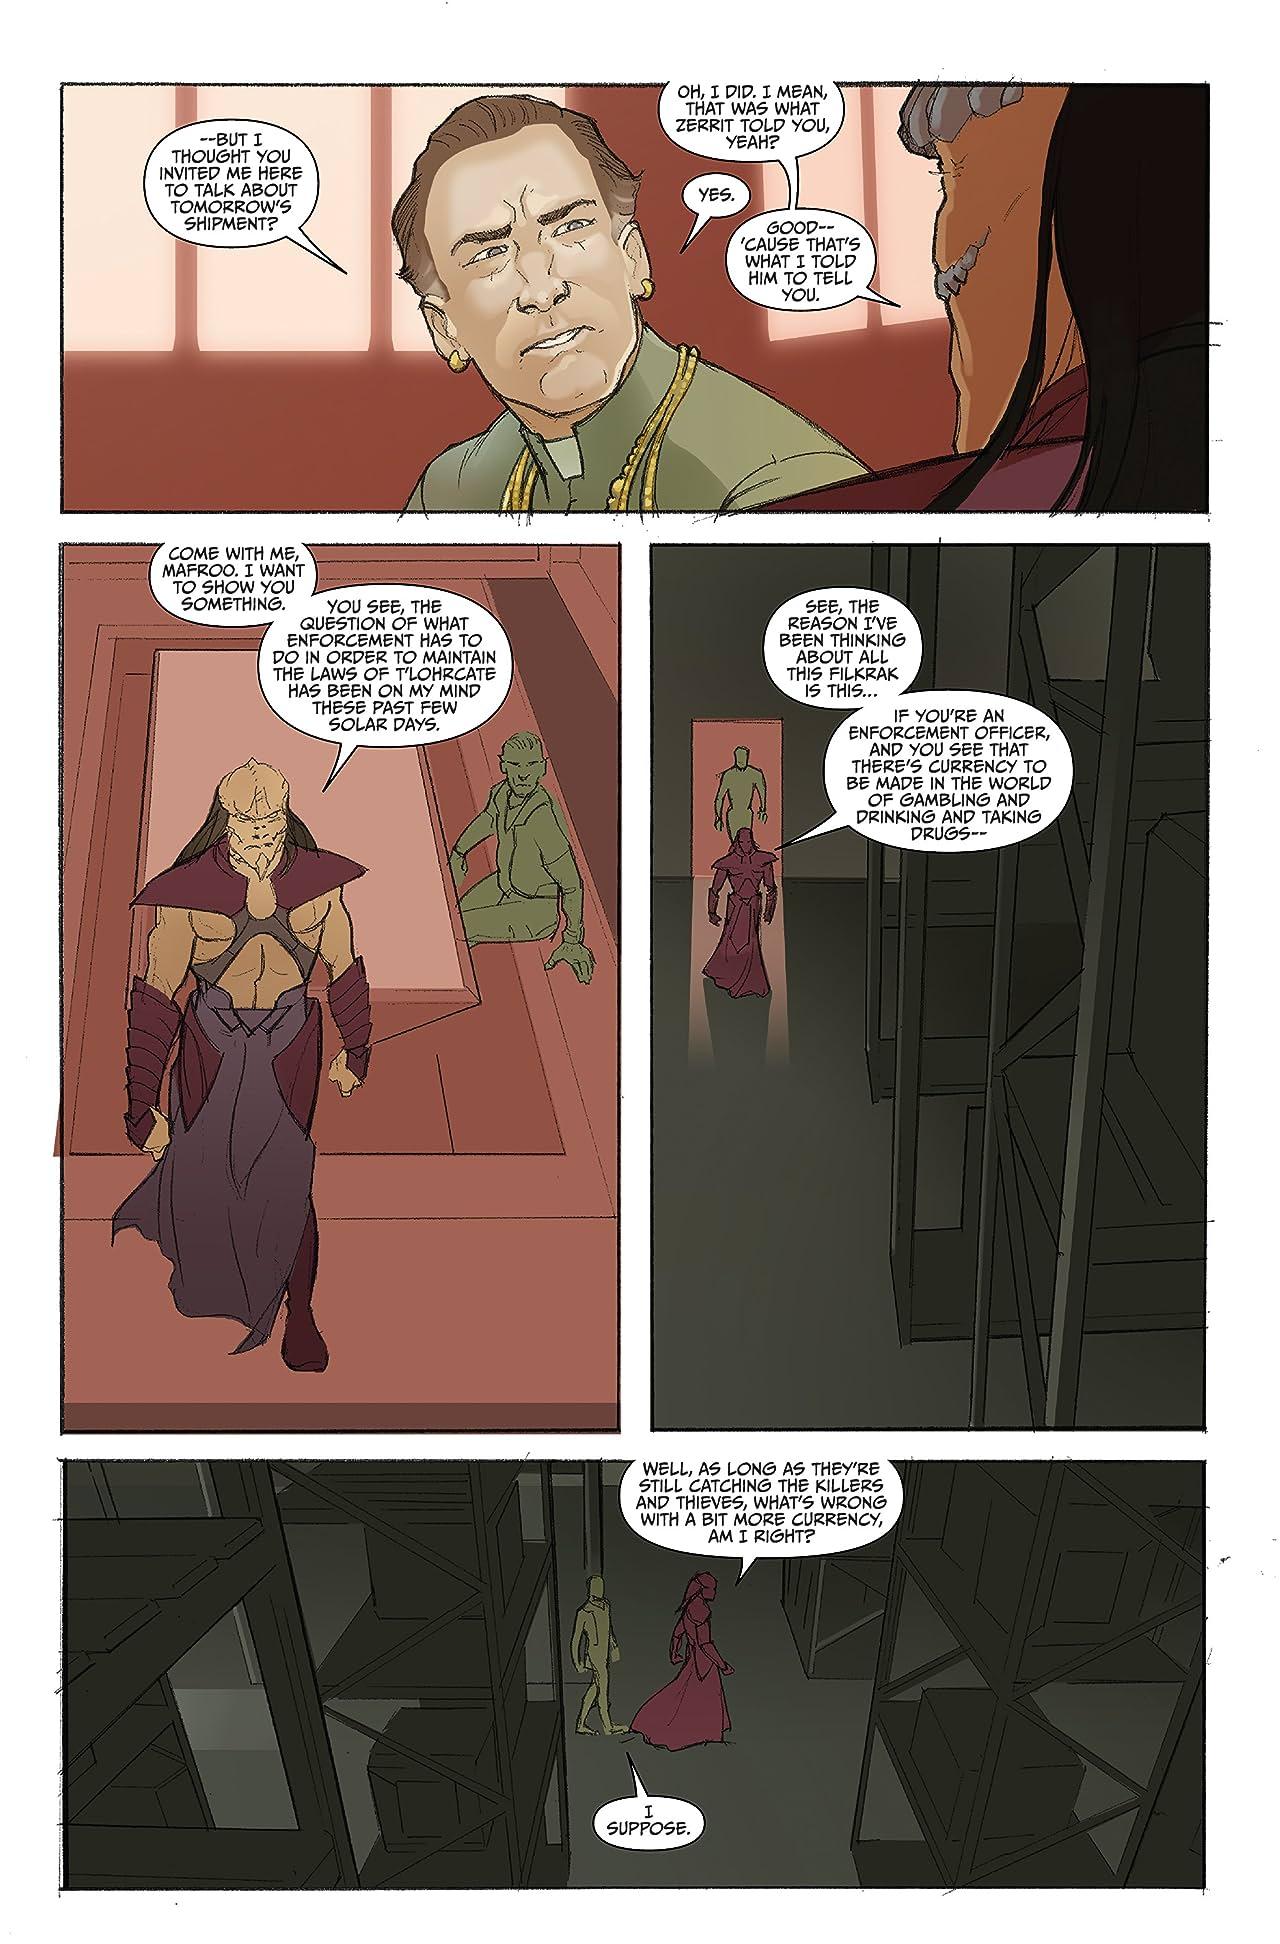 Farscape: Uncharted Tales Vol. 3: D'Argo's Quest #1 (of 4)